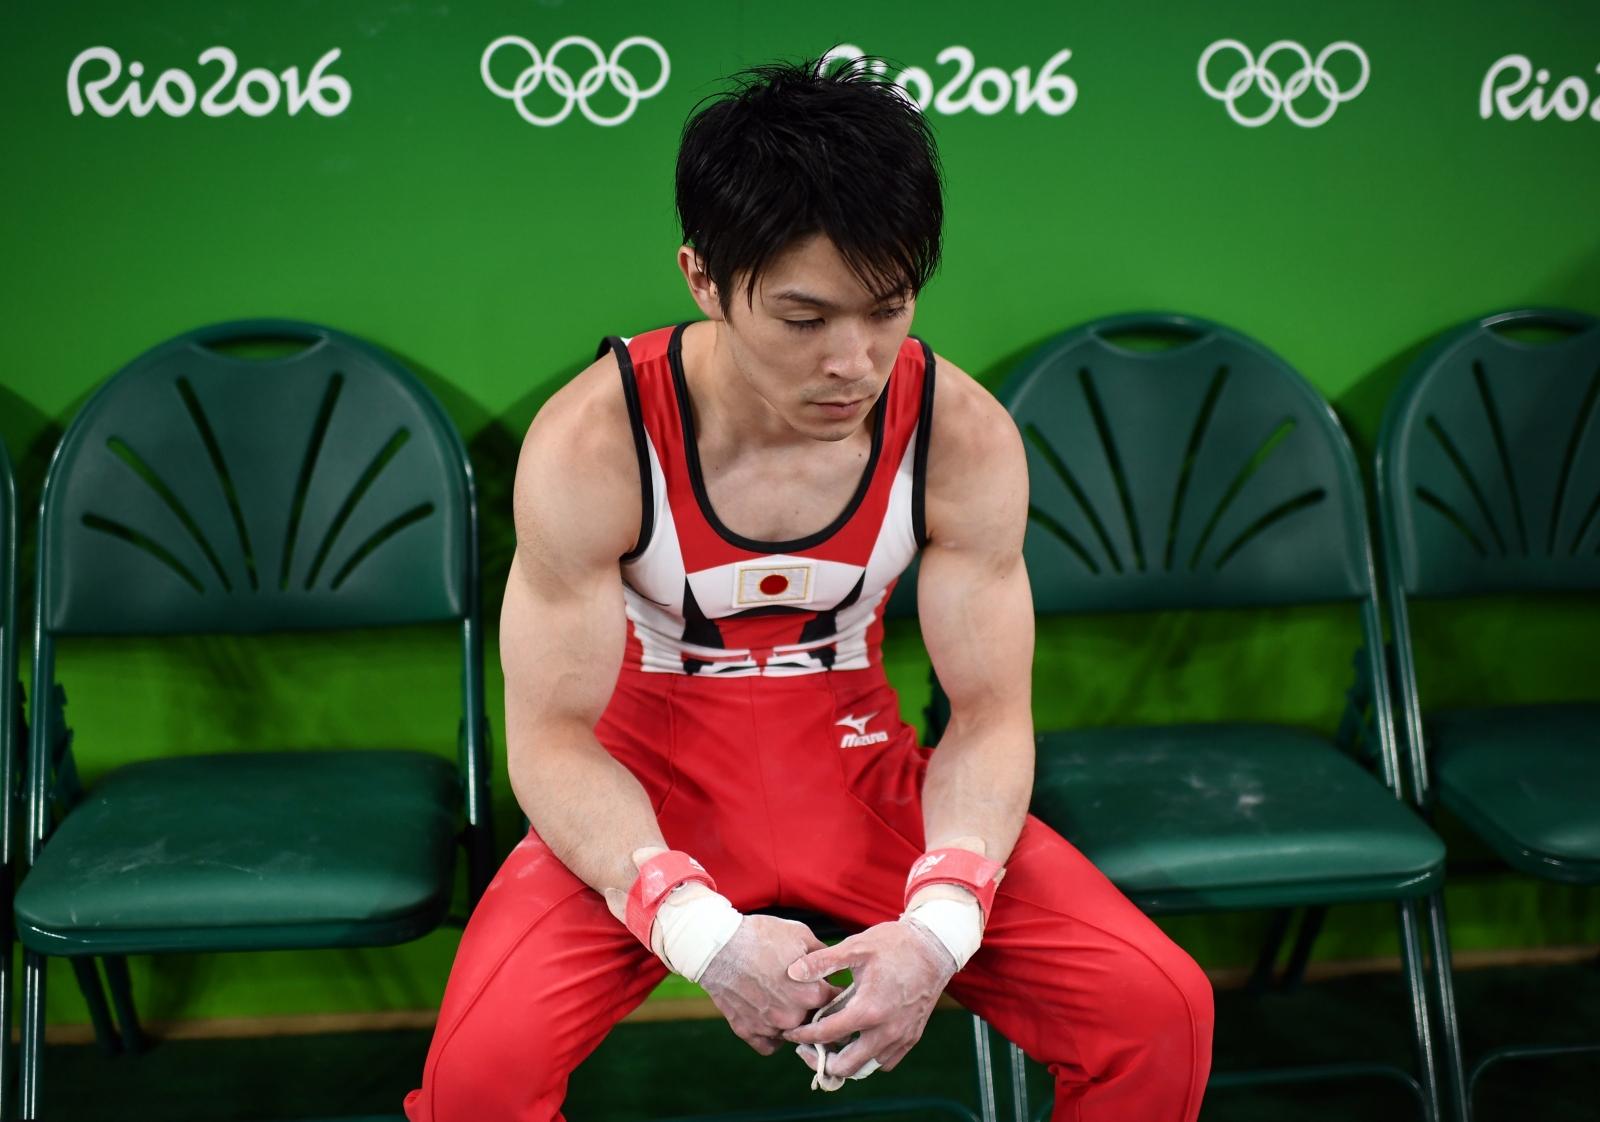 Japanese Men's Gymnastics Olympic champion Kohei Uchimura